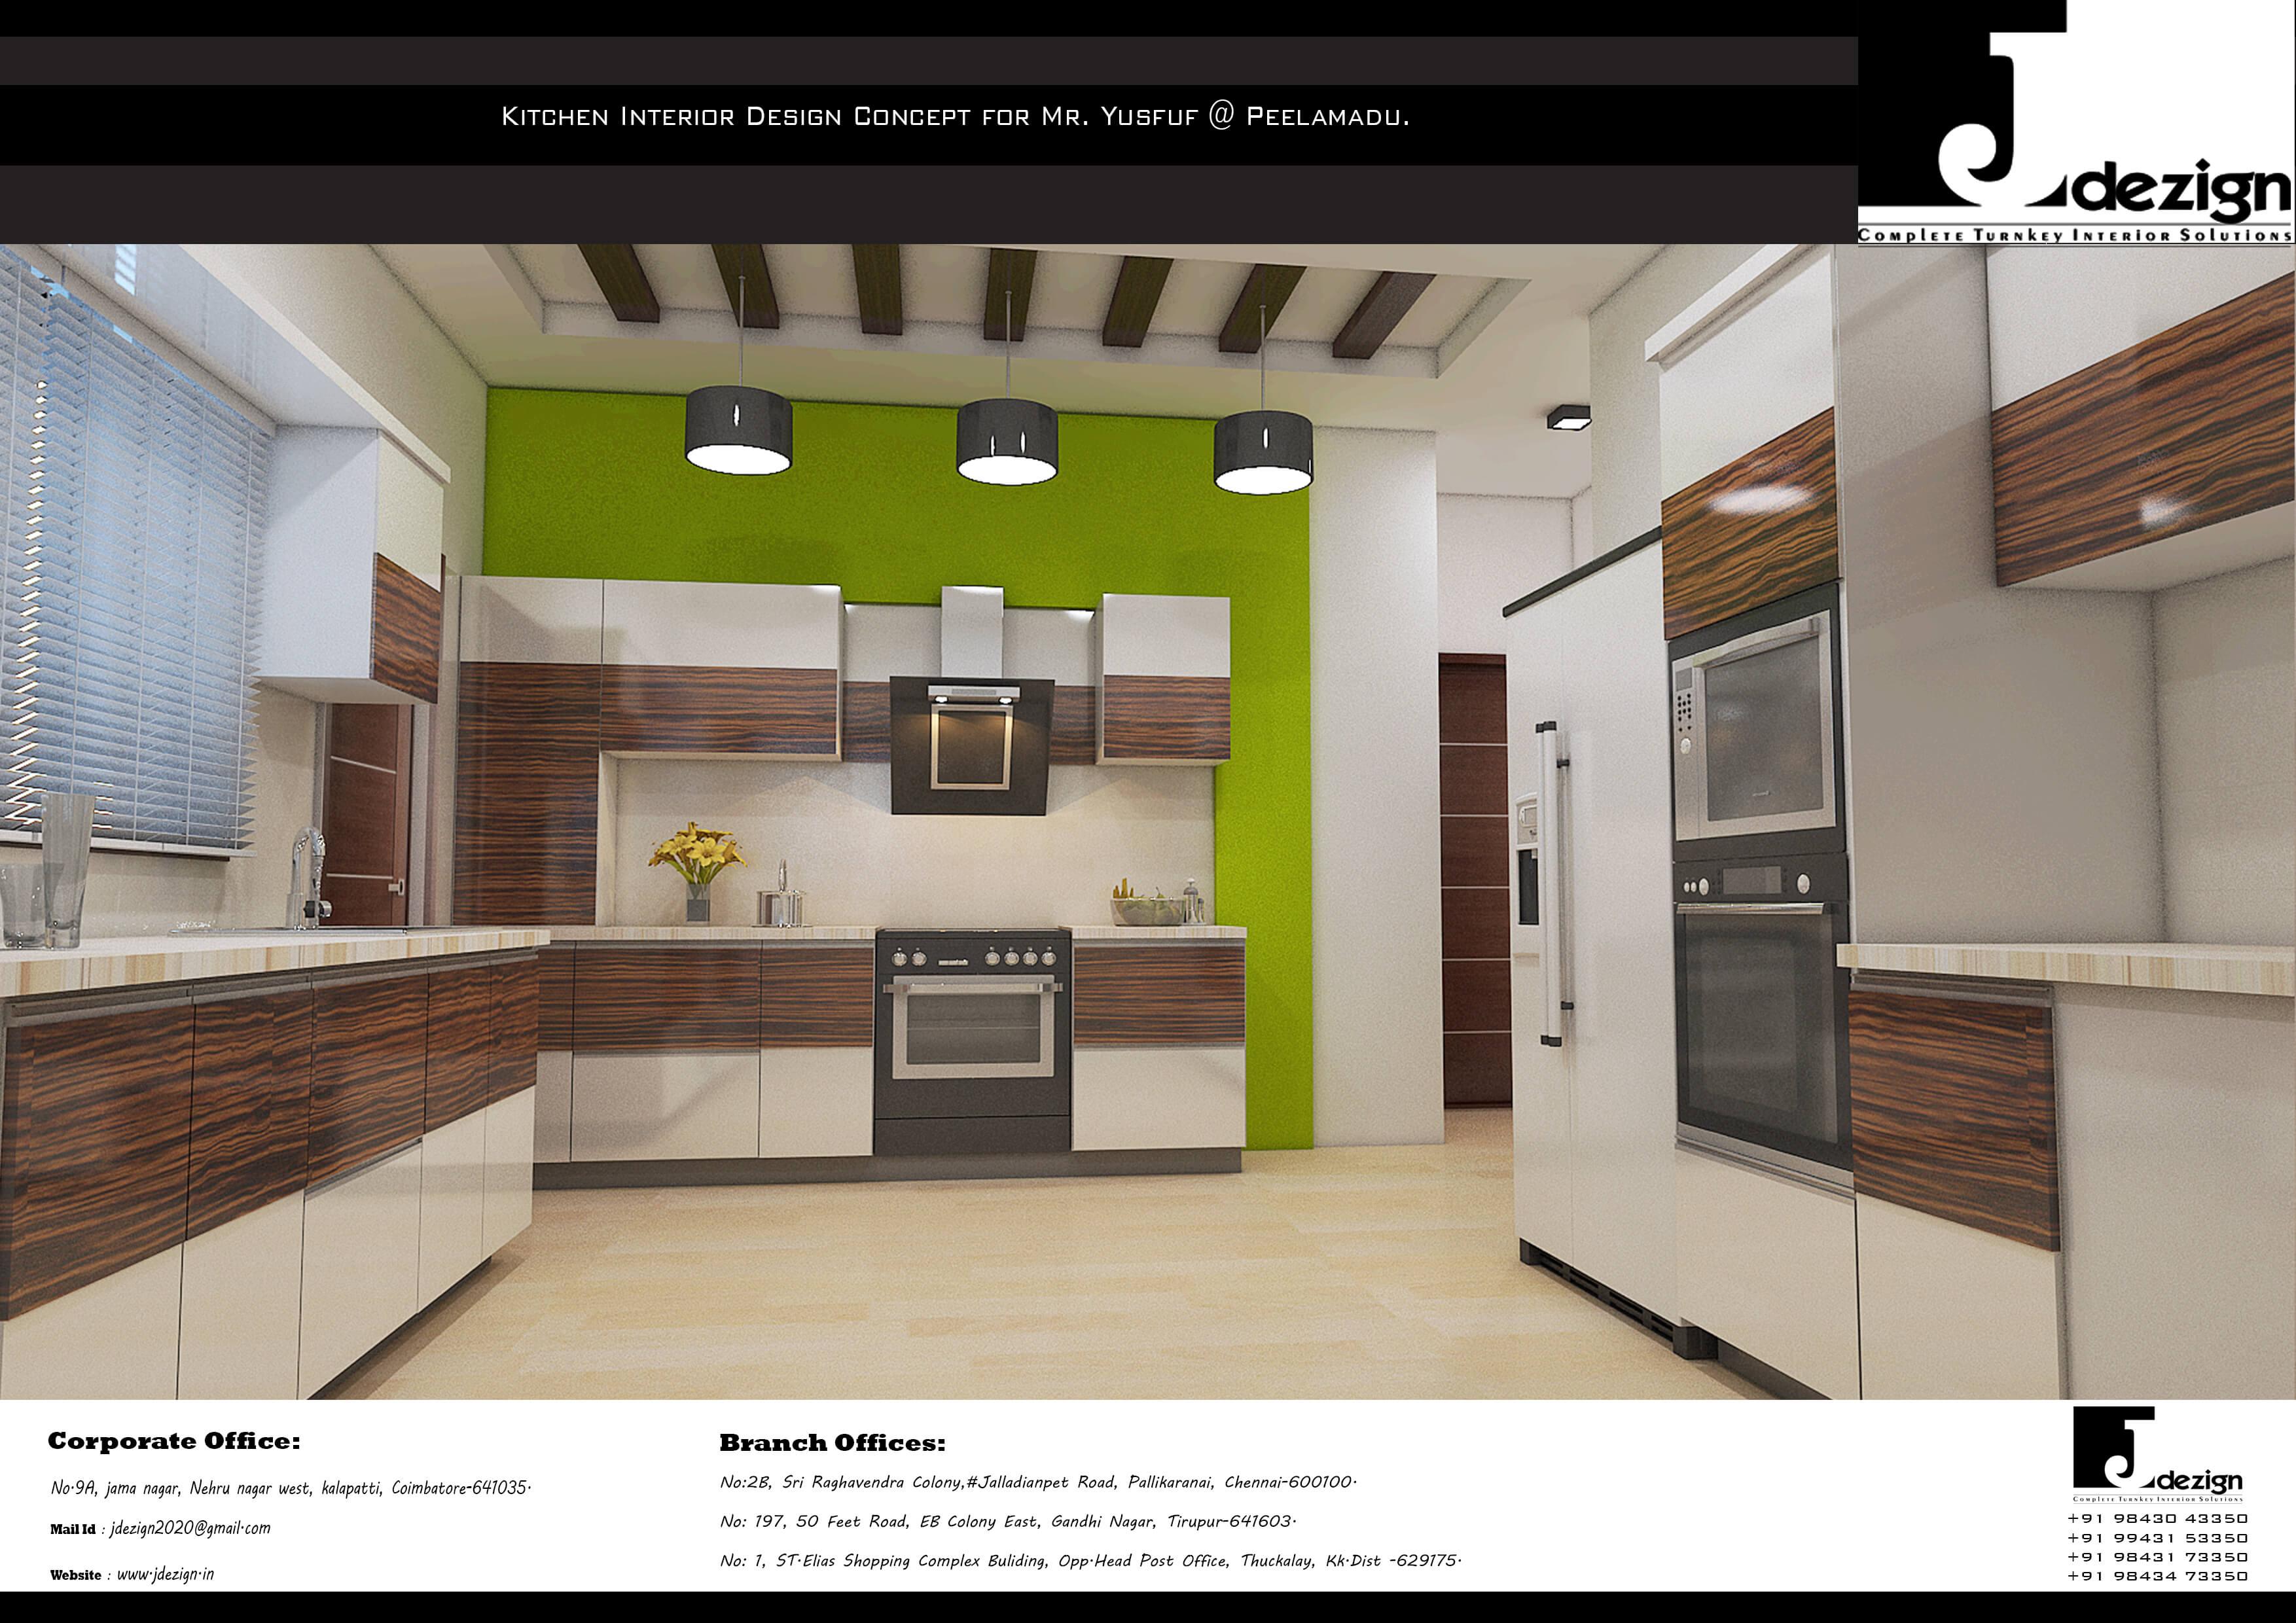 Modular Kitchen in Coimbatore   Jdezign.in